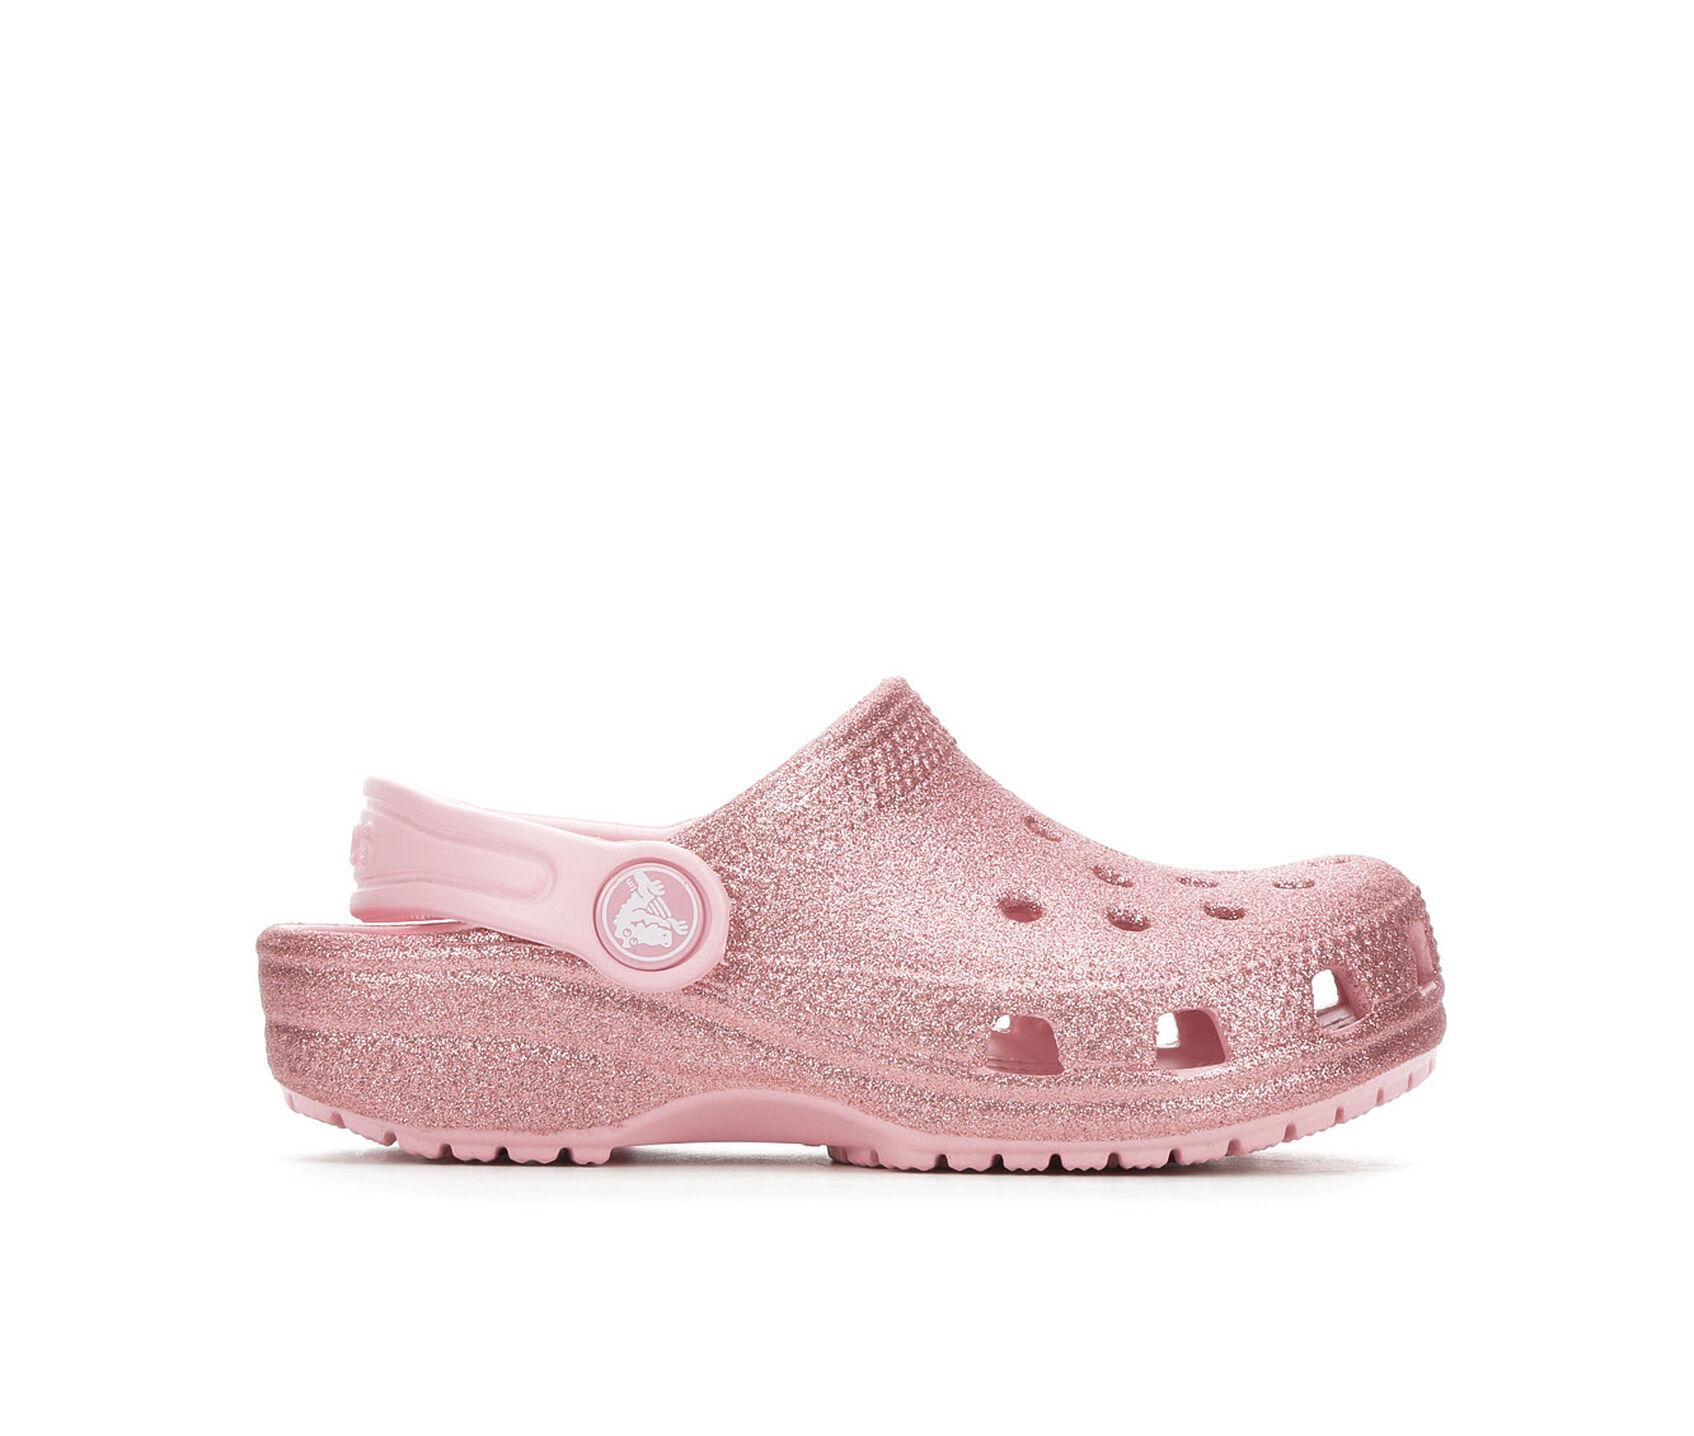 9f118477037f ... Crocs Toddler Classic Glitter Clog. Previous